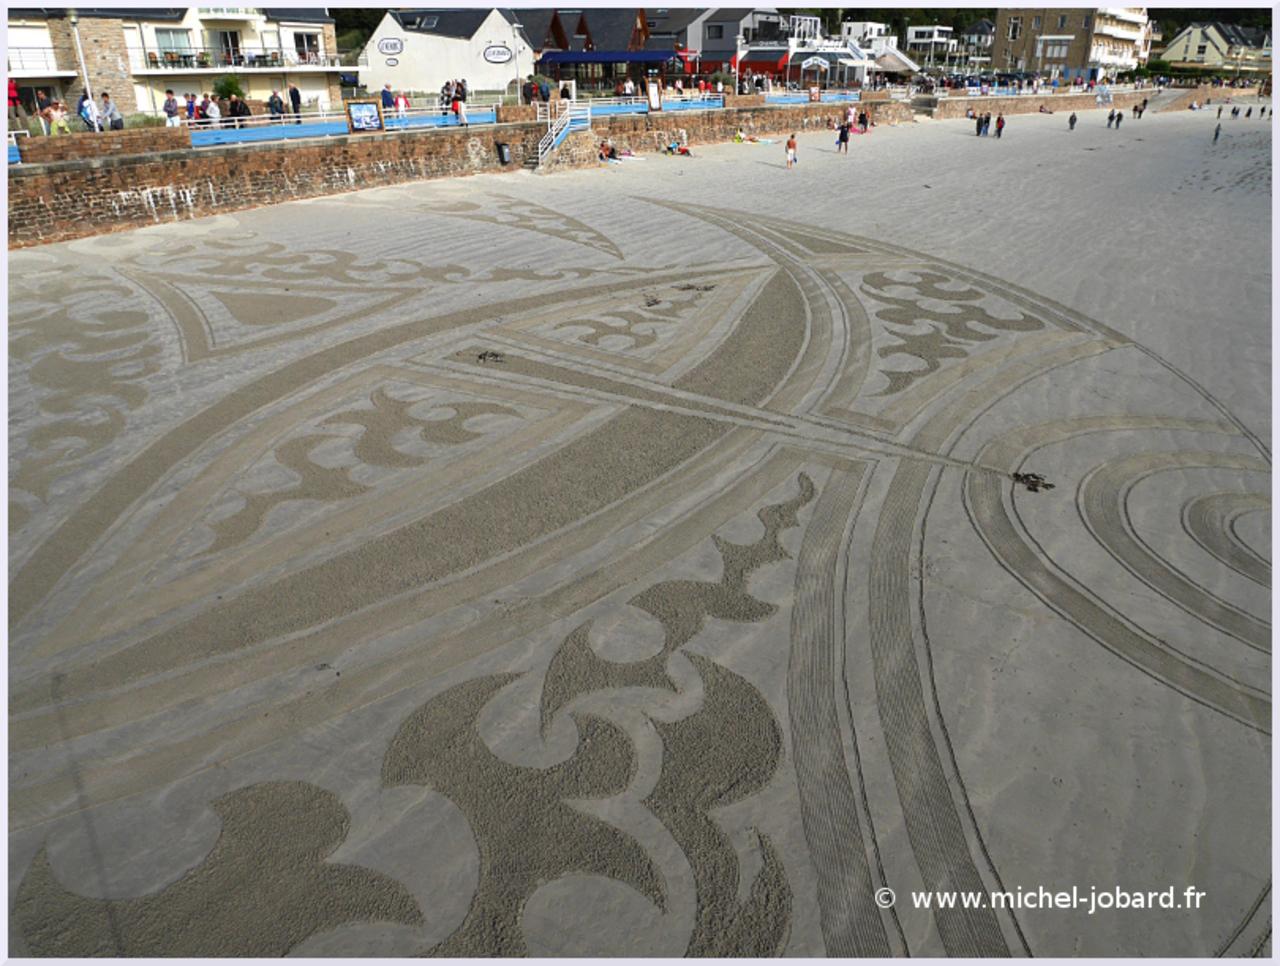 beach-art-celtitude-19-septembre-2016-02